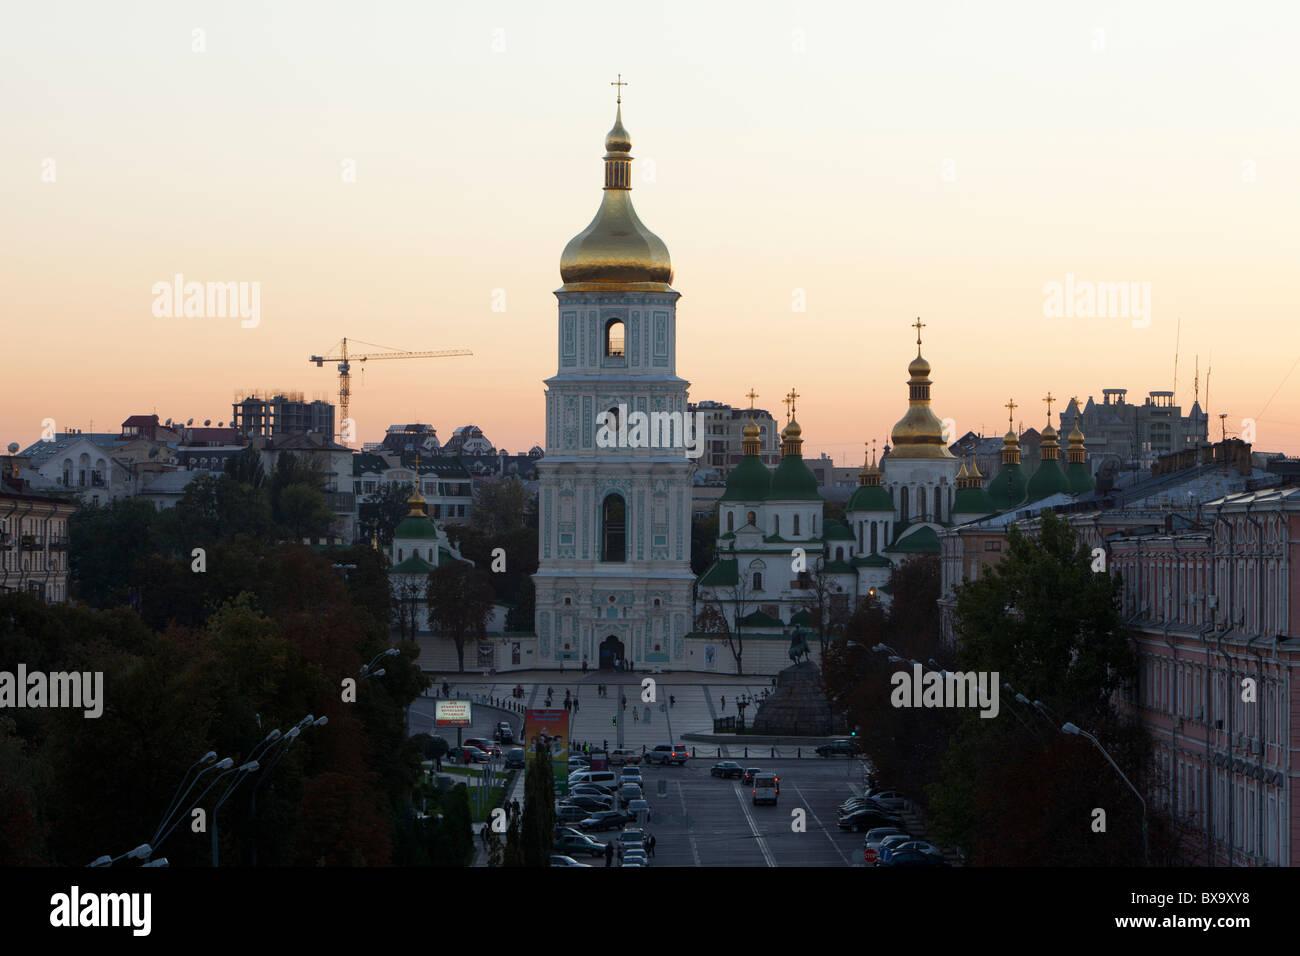 Saint Sophia Cathedral at sunset in Kiev, Ukraine - Stock Image